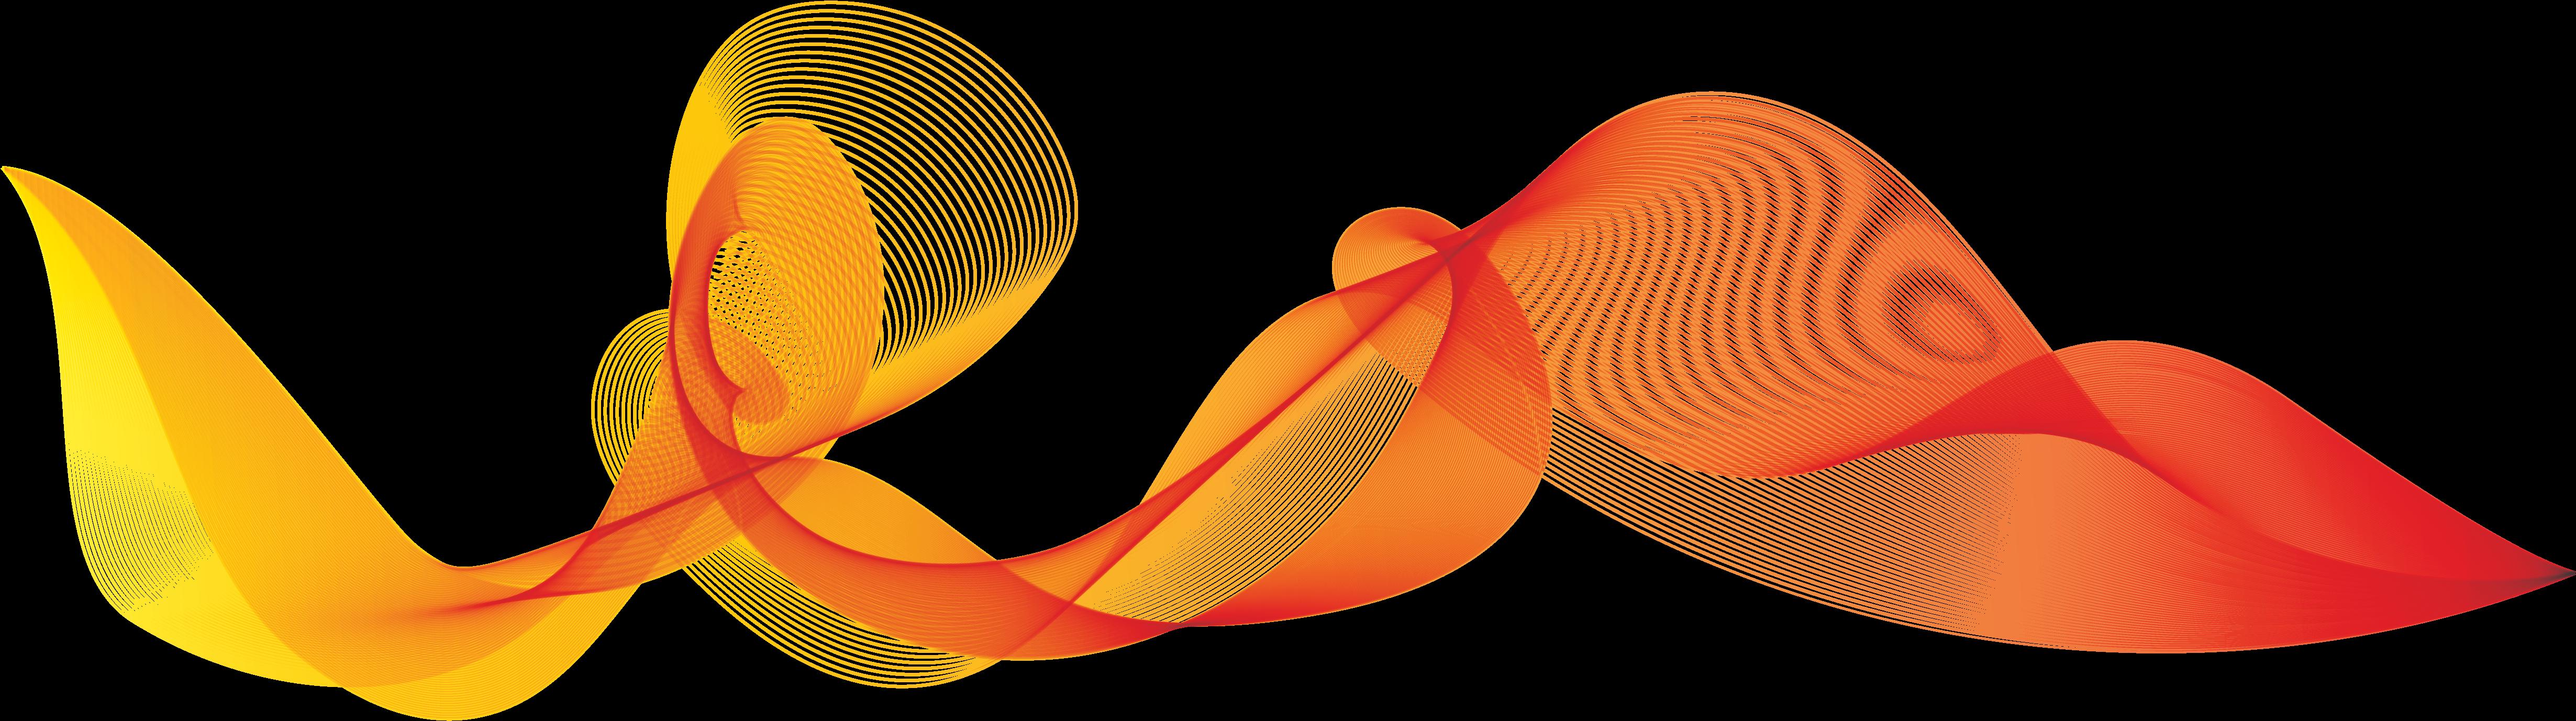 Orange Waves Png Clipart